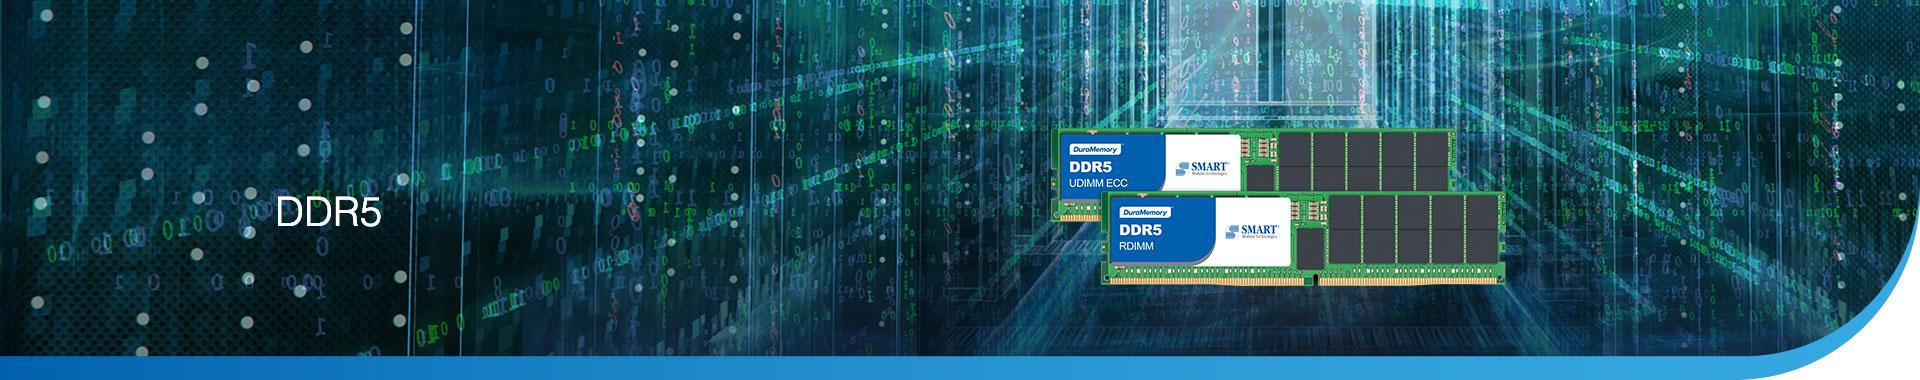 SMART_DuraMemory_DDR5